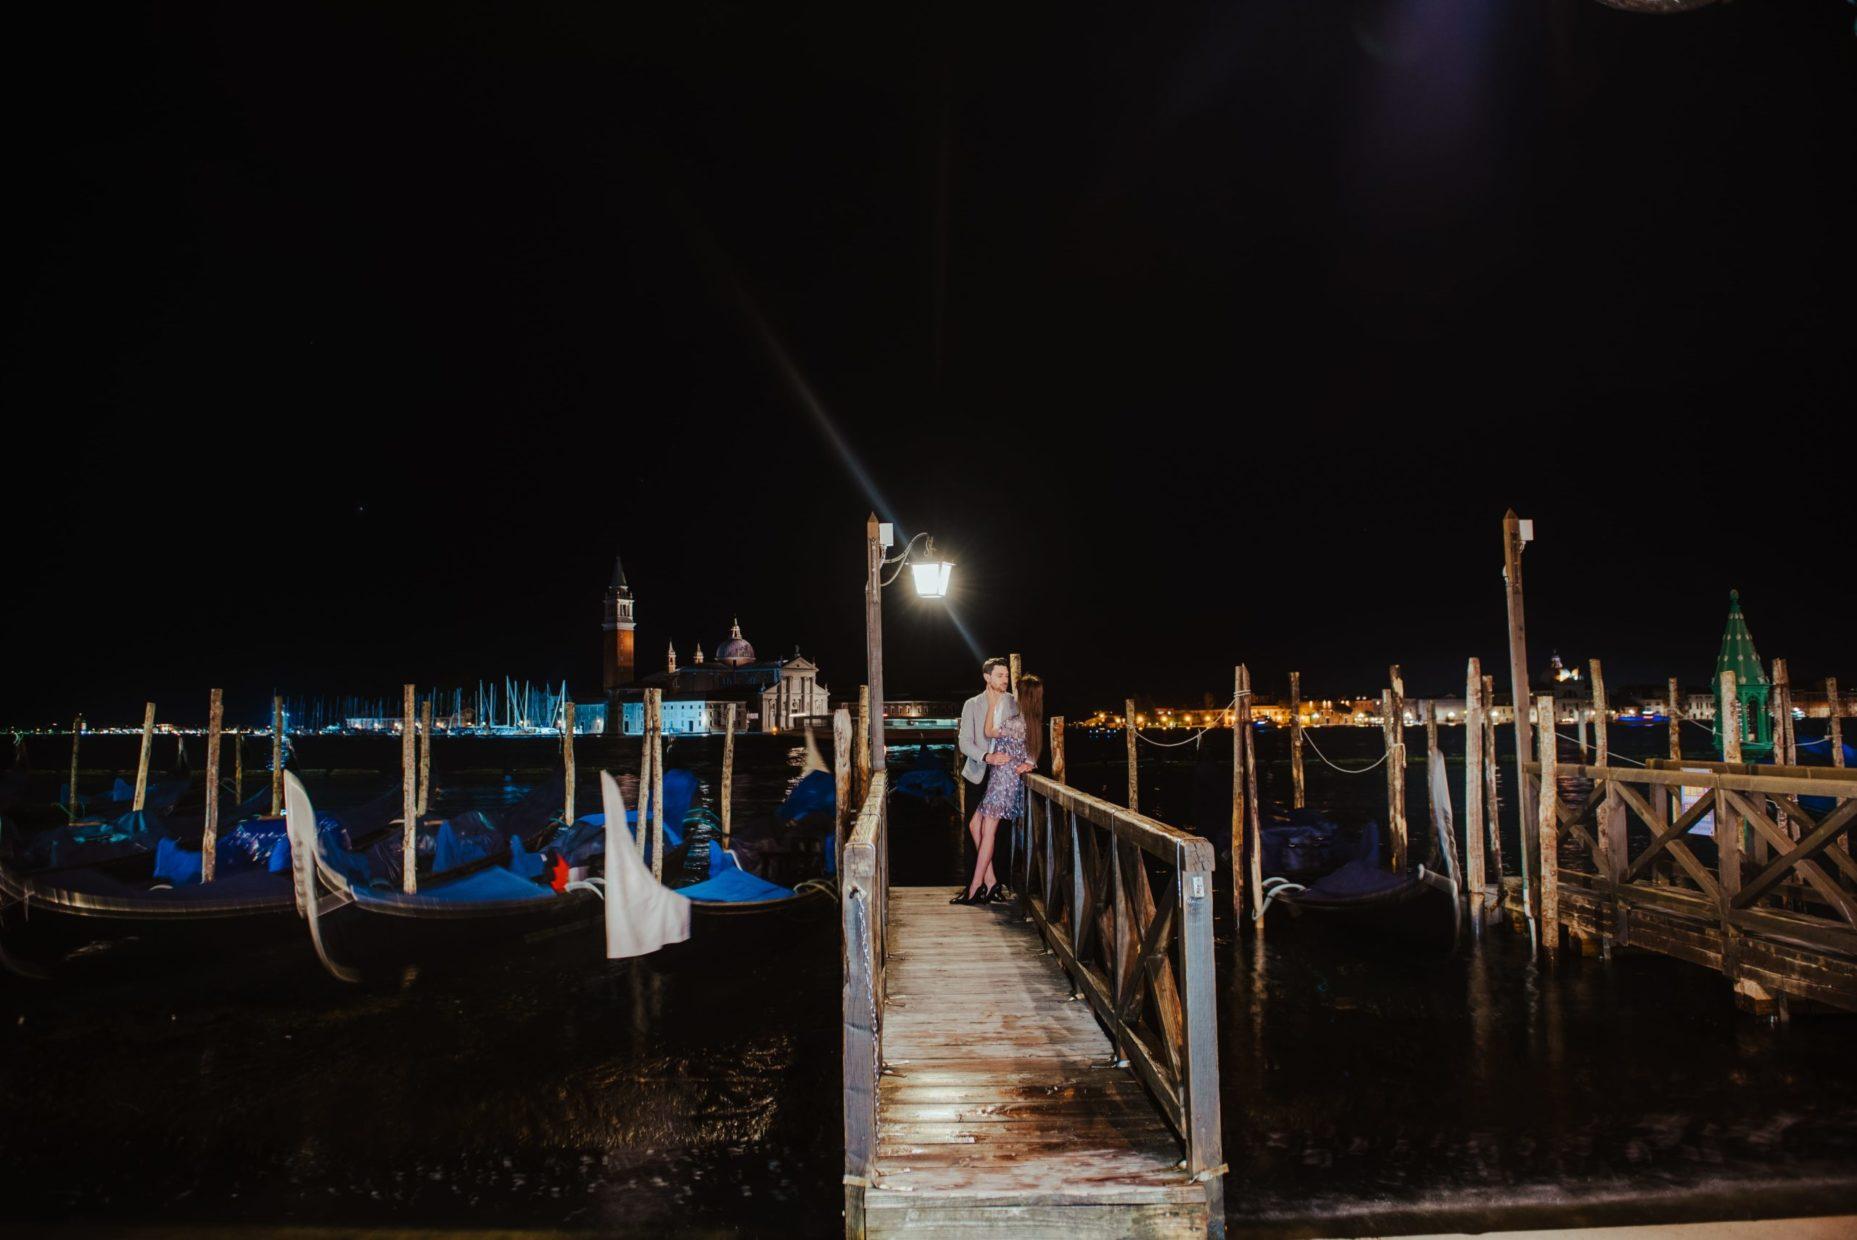 servizio fotografico engagement lucca pisa montecatini versilia forte dei marmi pietrasanta viareggio massa